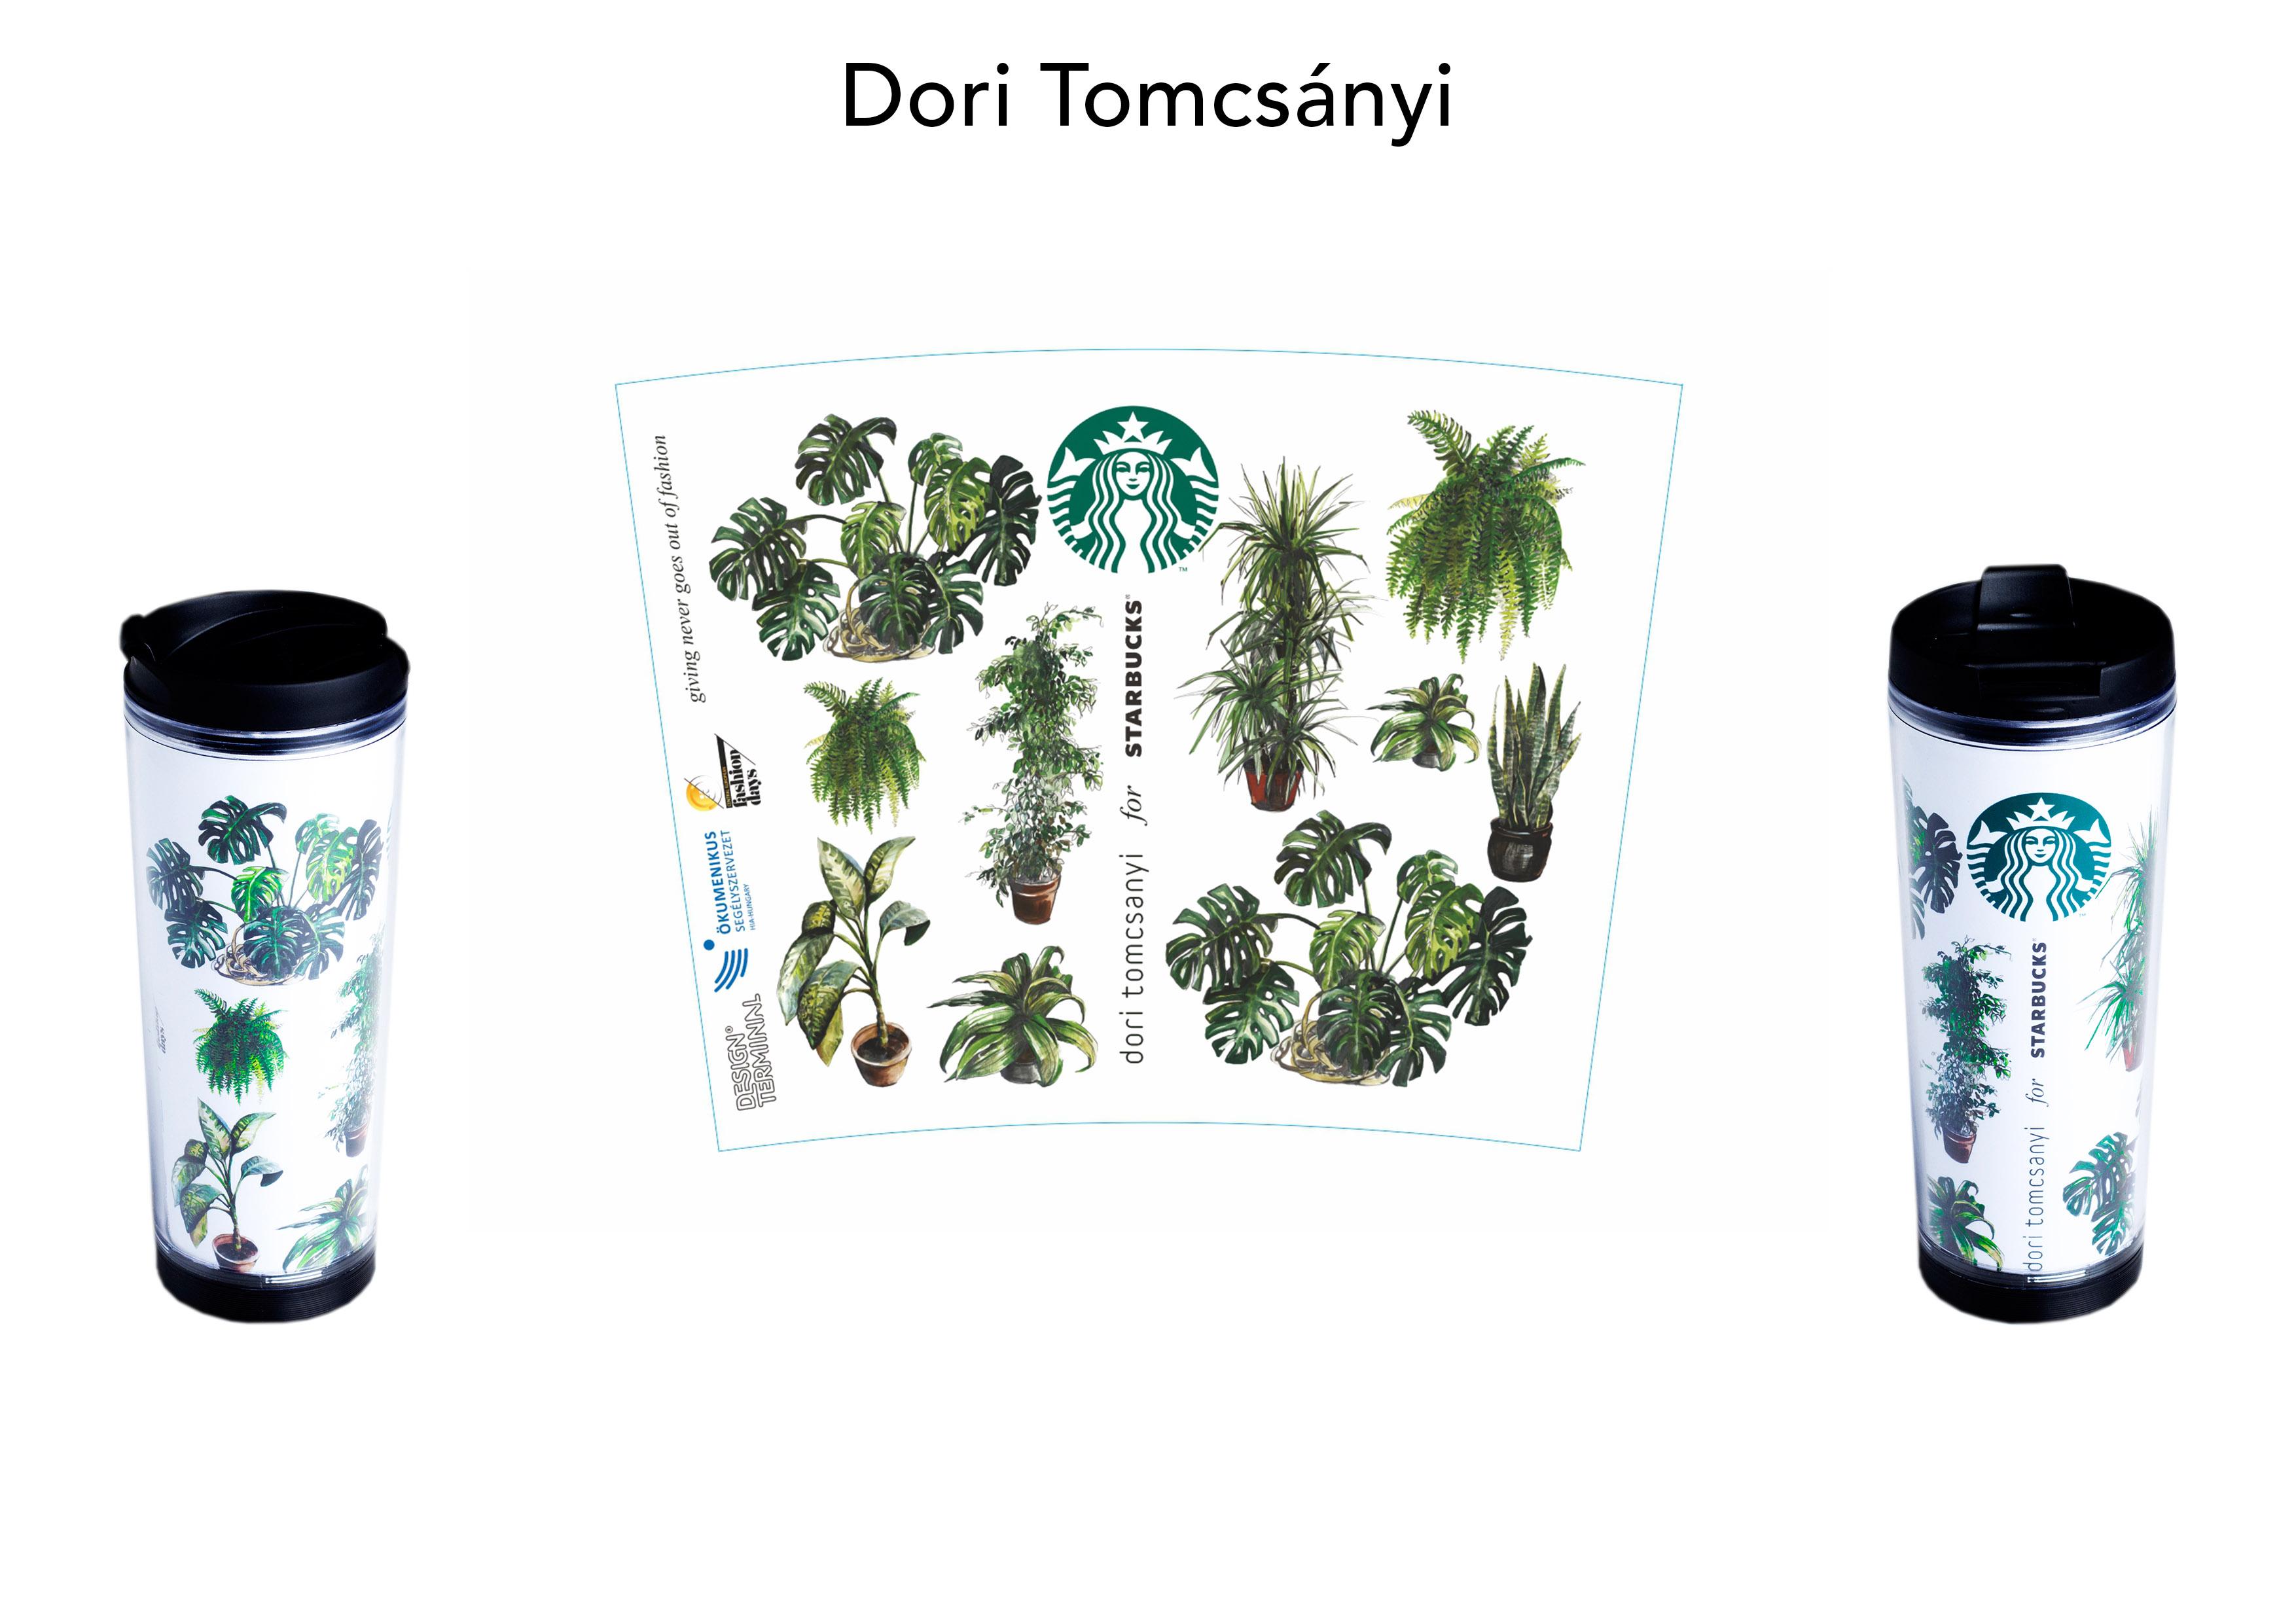 Stb Dori Tomcsanyi.jpg